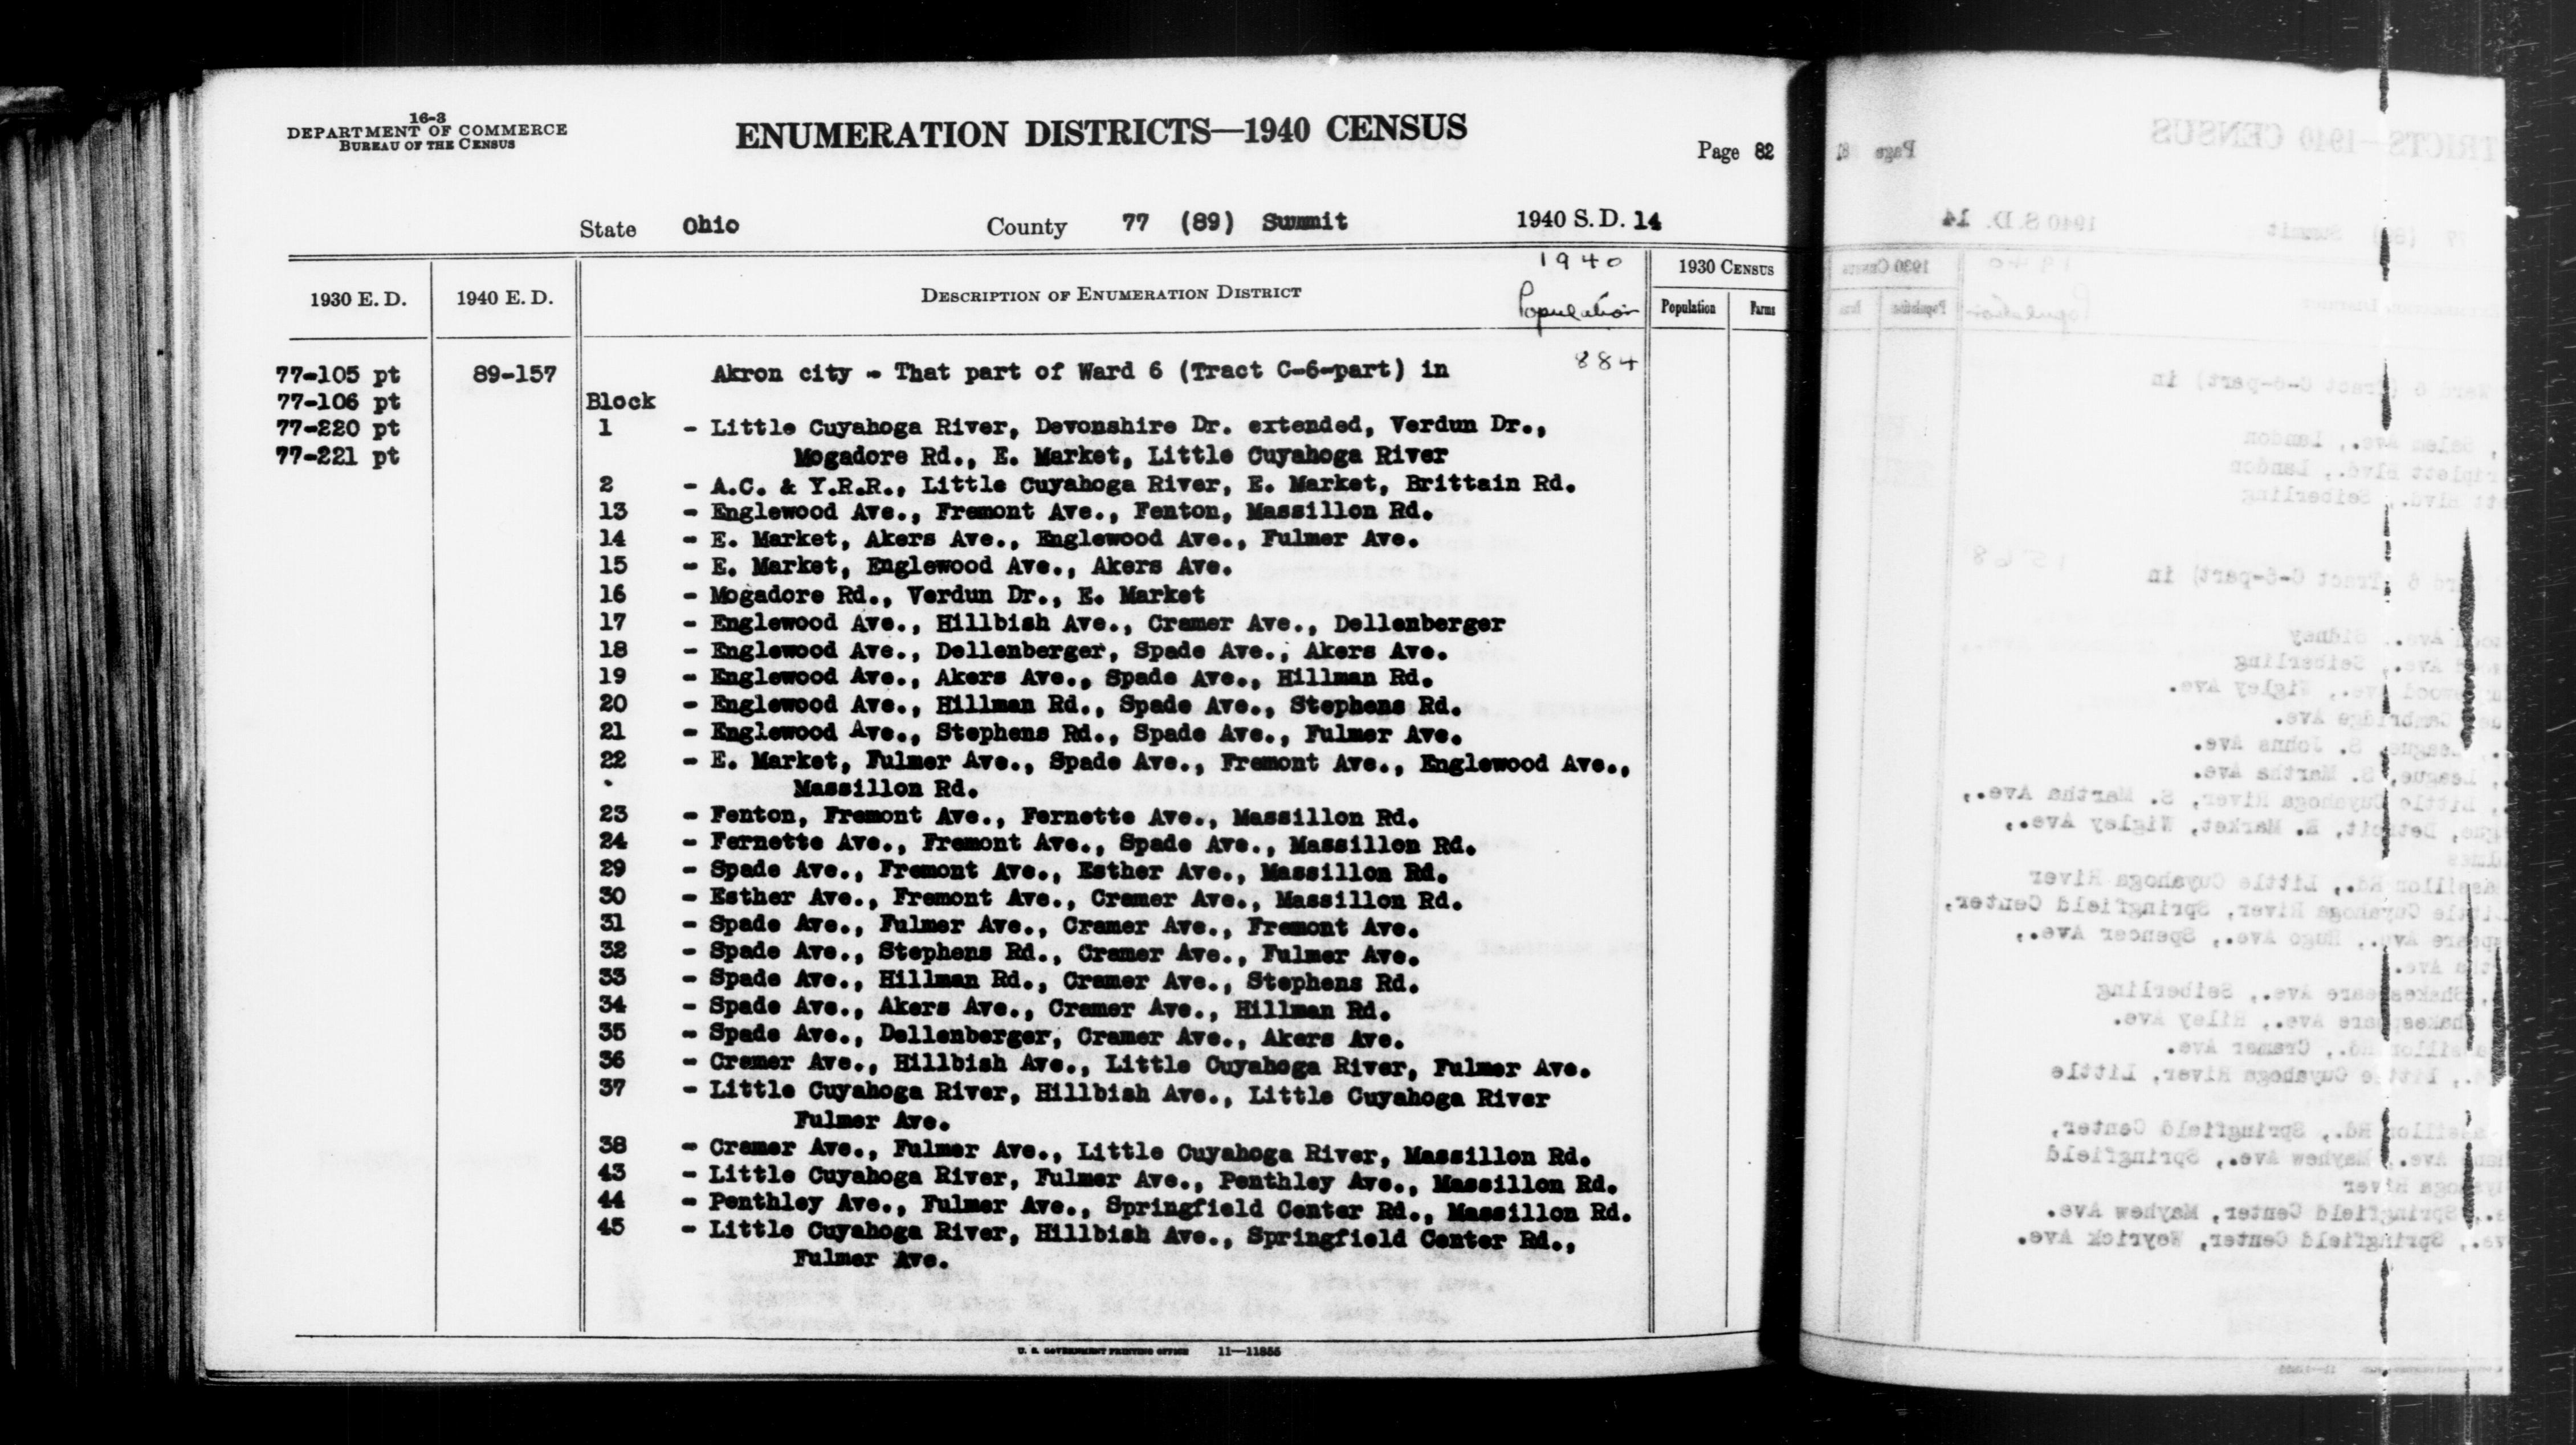 1940 Census Enumeration District Descriptions - Ohio - Summit County - ED 89-157